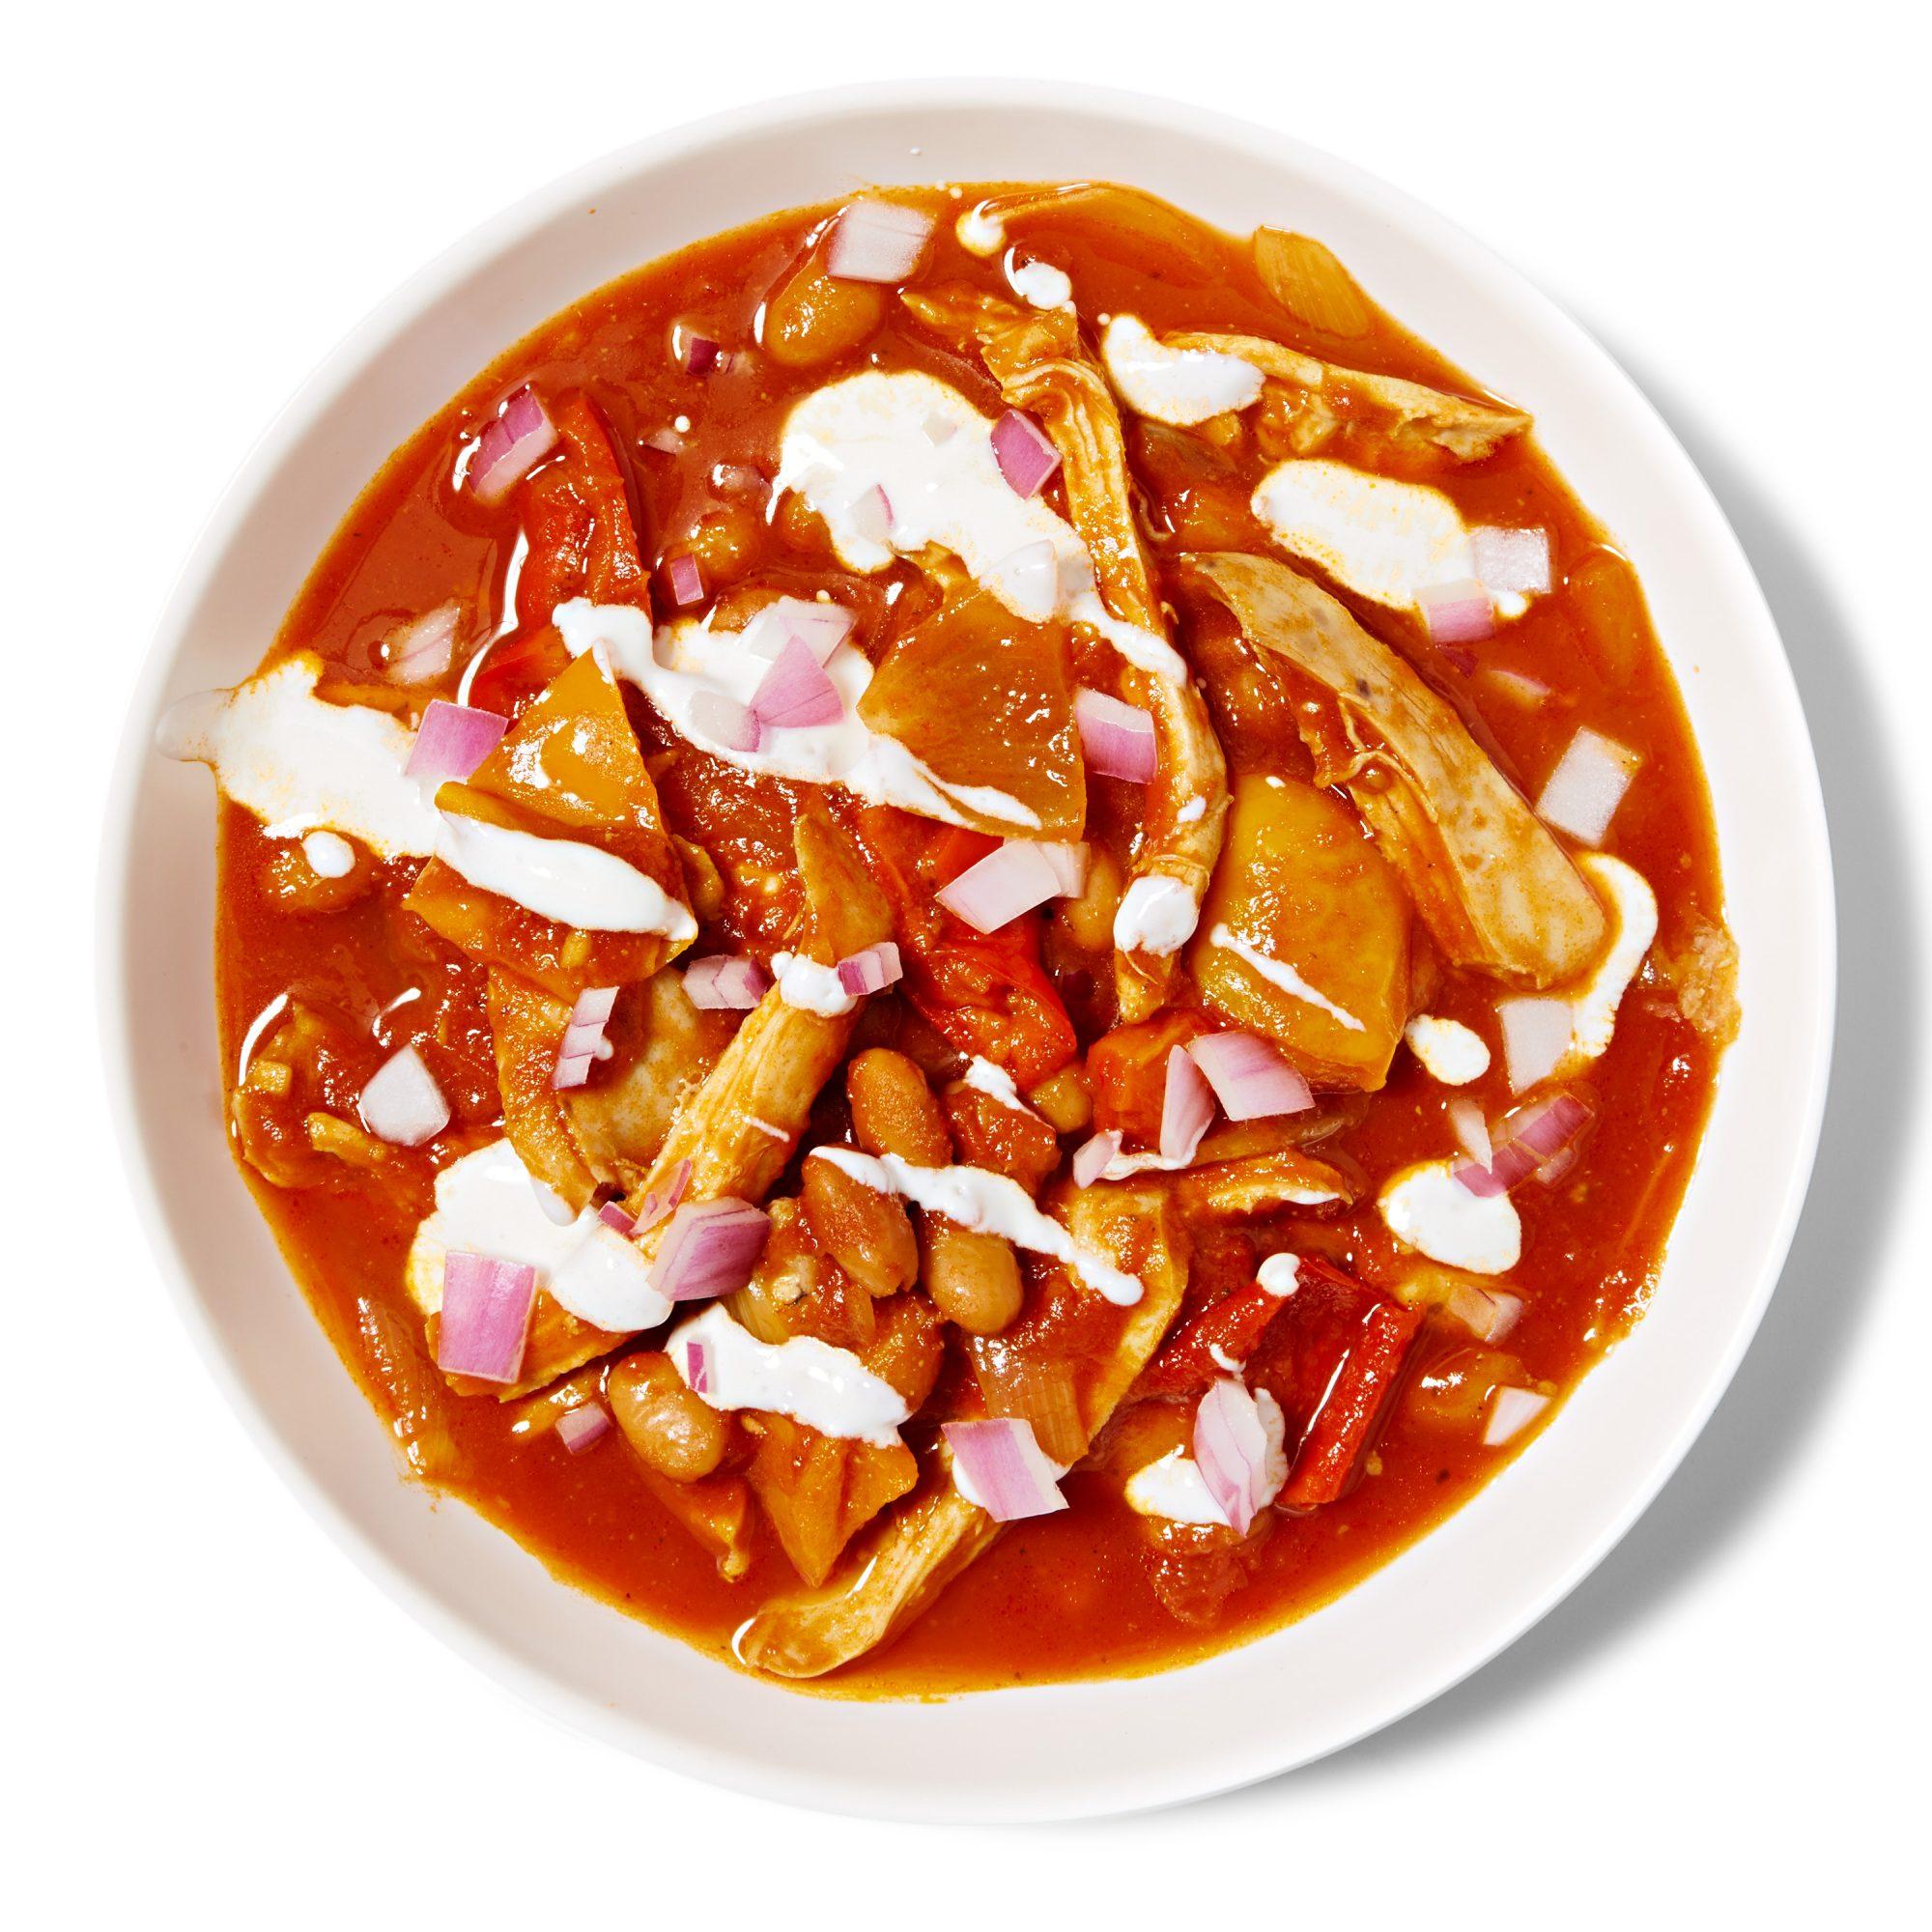 Smoky Chicken & Pinto Bean Chili